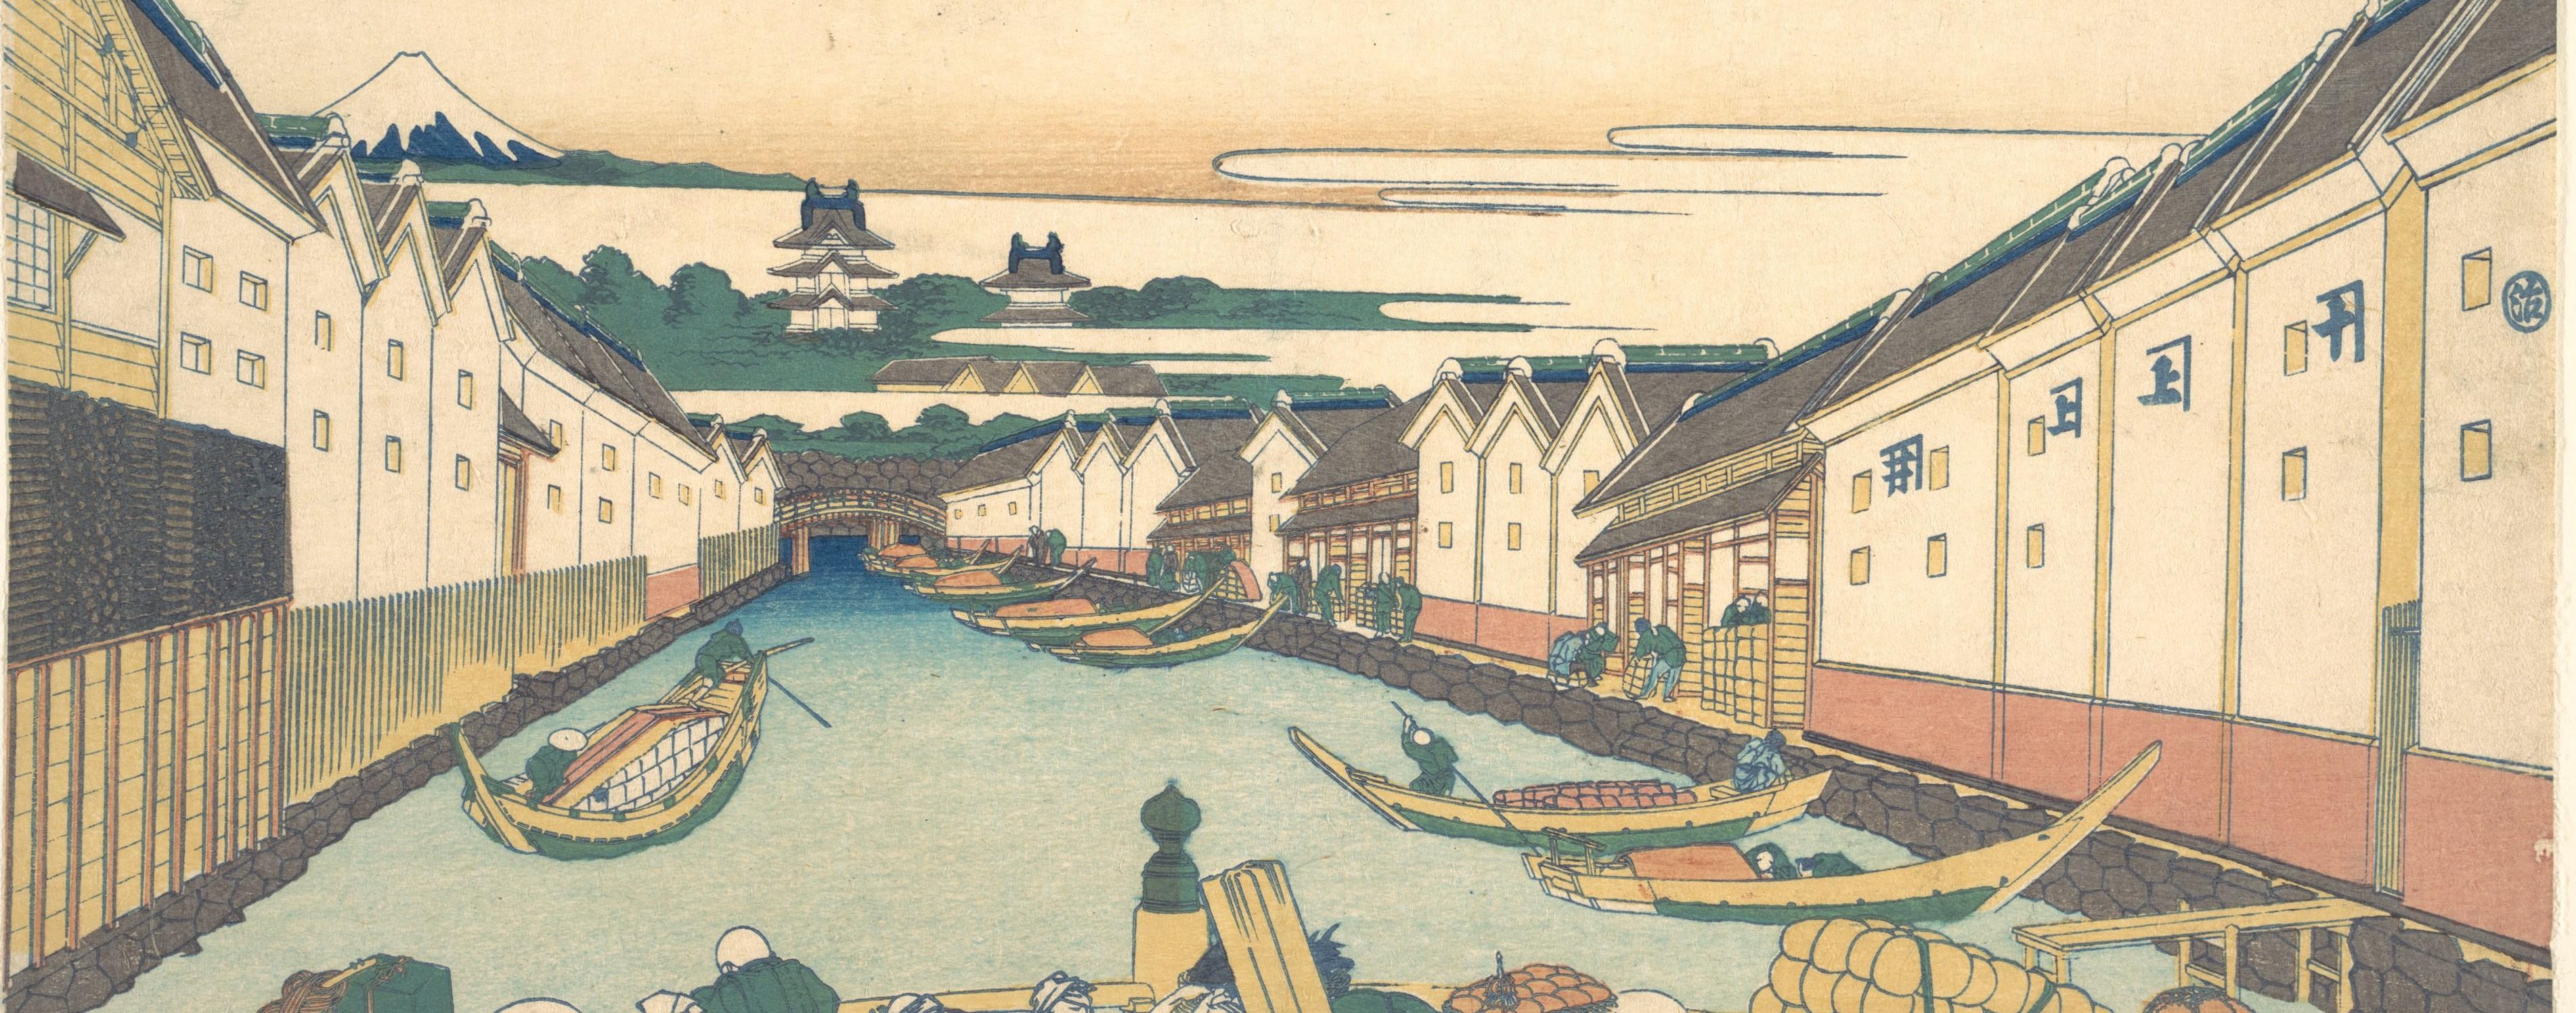 -Nihonbashi_in_Edo_Edo_Nihonbashi_from_the_series_Thirty-six_Views_of_Mount_Fuji_Fugaku_sanjurokkei_MET_DP141003.jpg